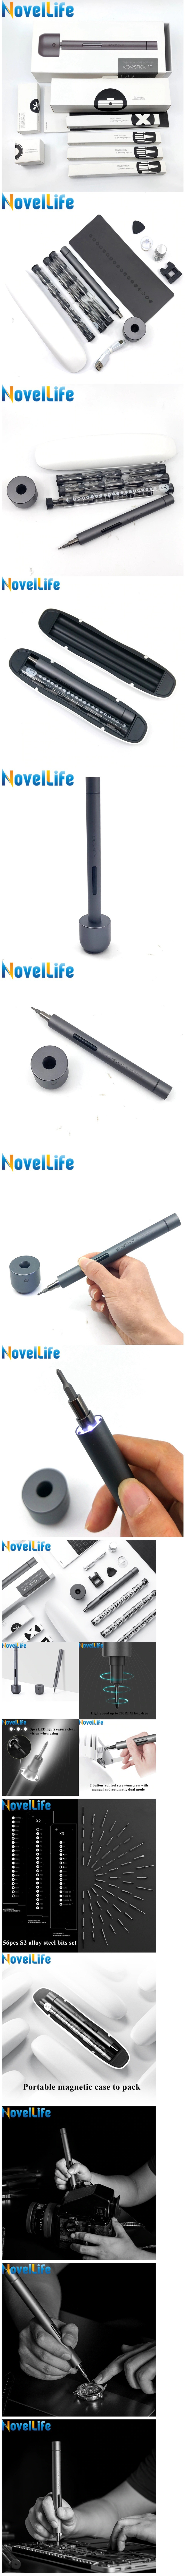 prezentare-surubelnita-electrica-novellife7bf3cb3576862718.jpg